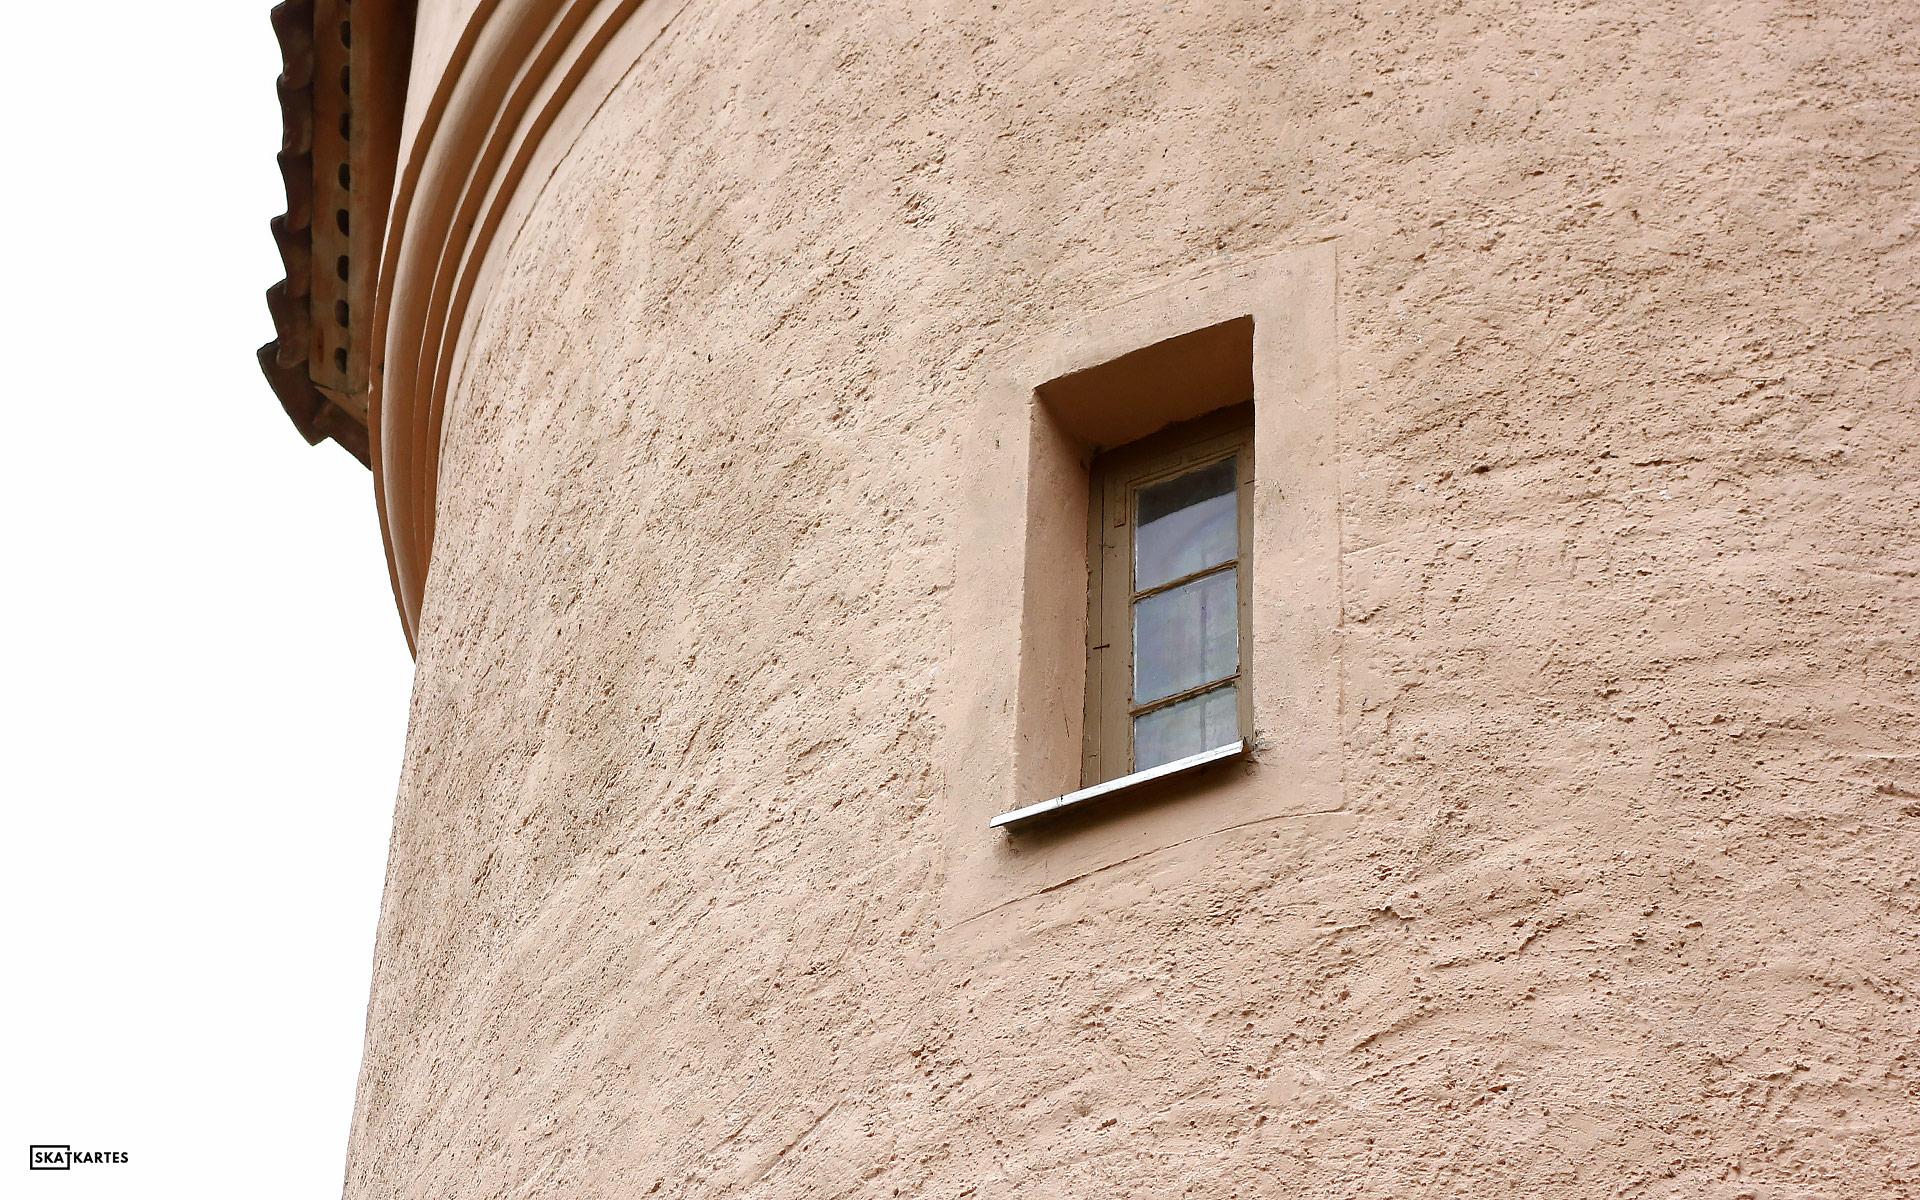 Skatkartes-Latvija-Vasara-Kurzeme-Edoles-pils-siena